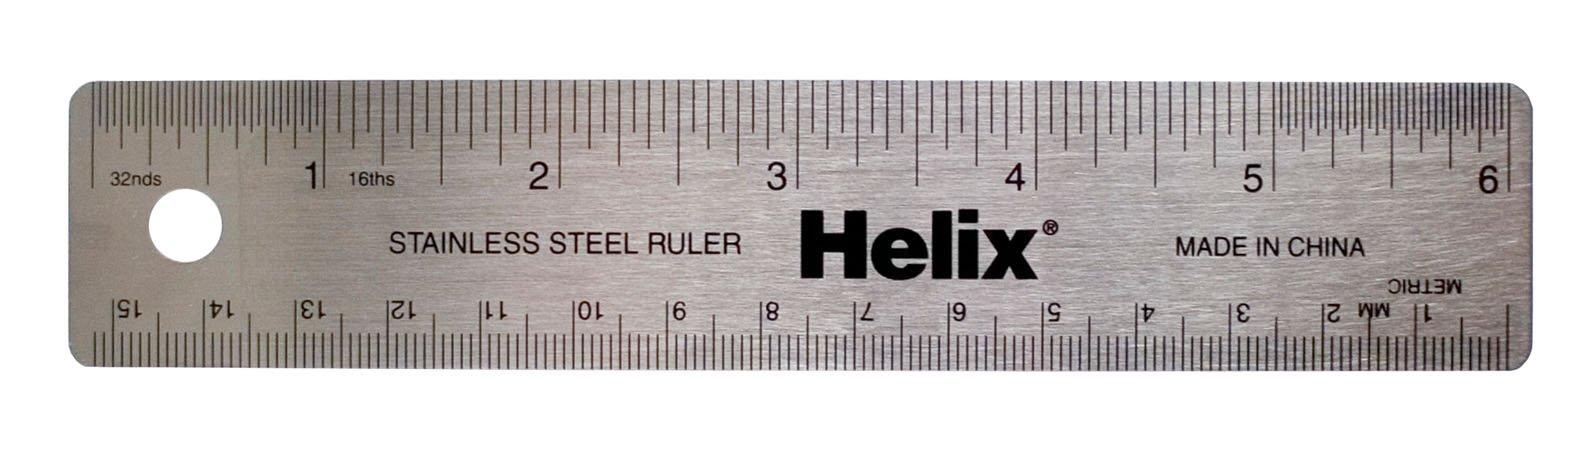 Helix Stainless Steel Ruler 6'' / 15cm (13006)